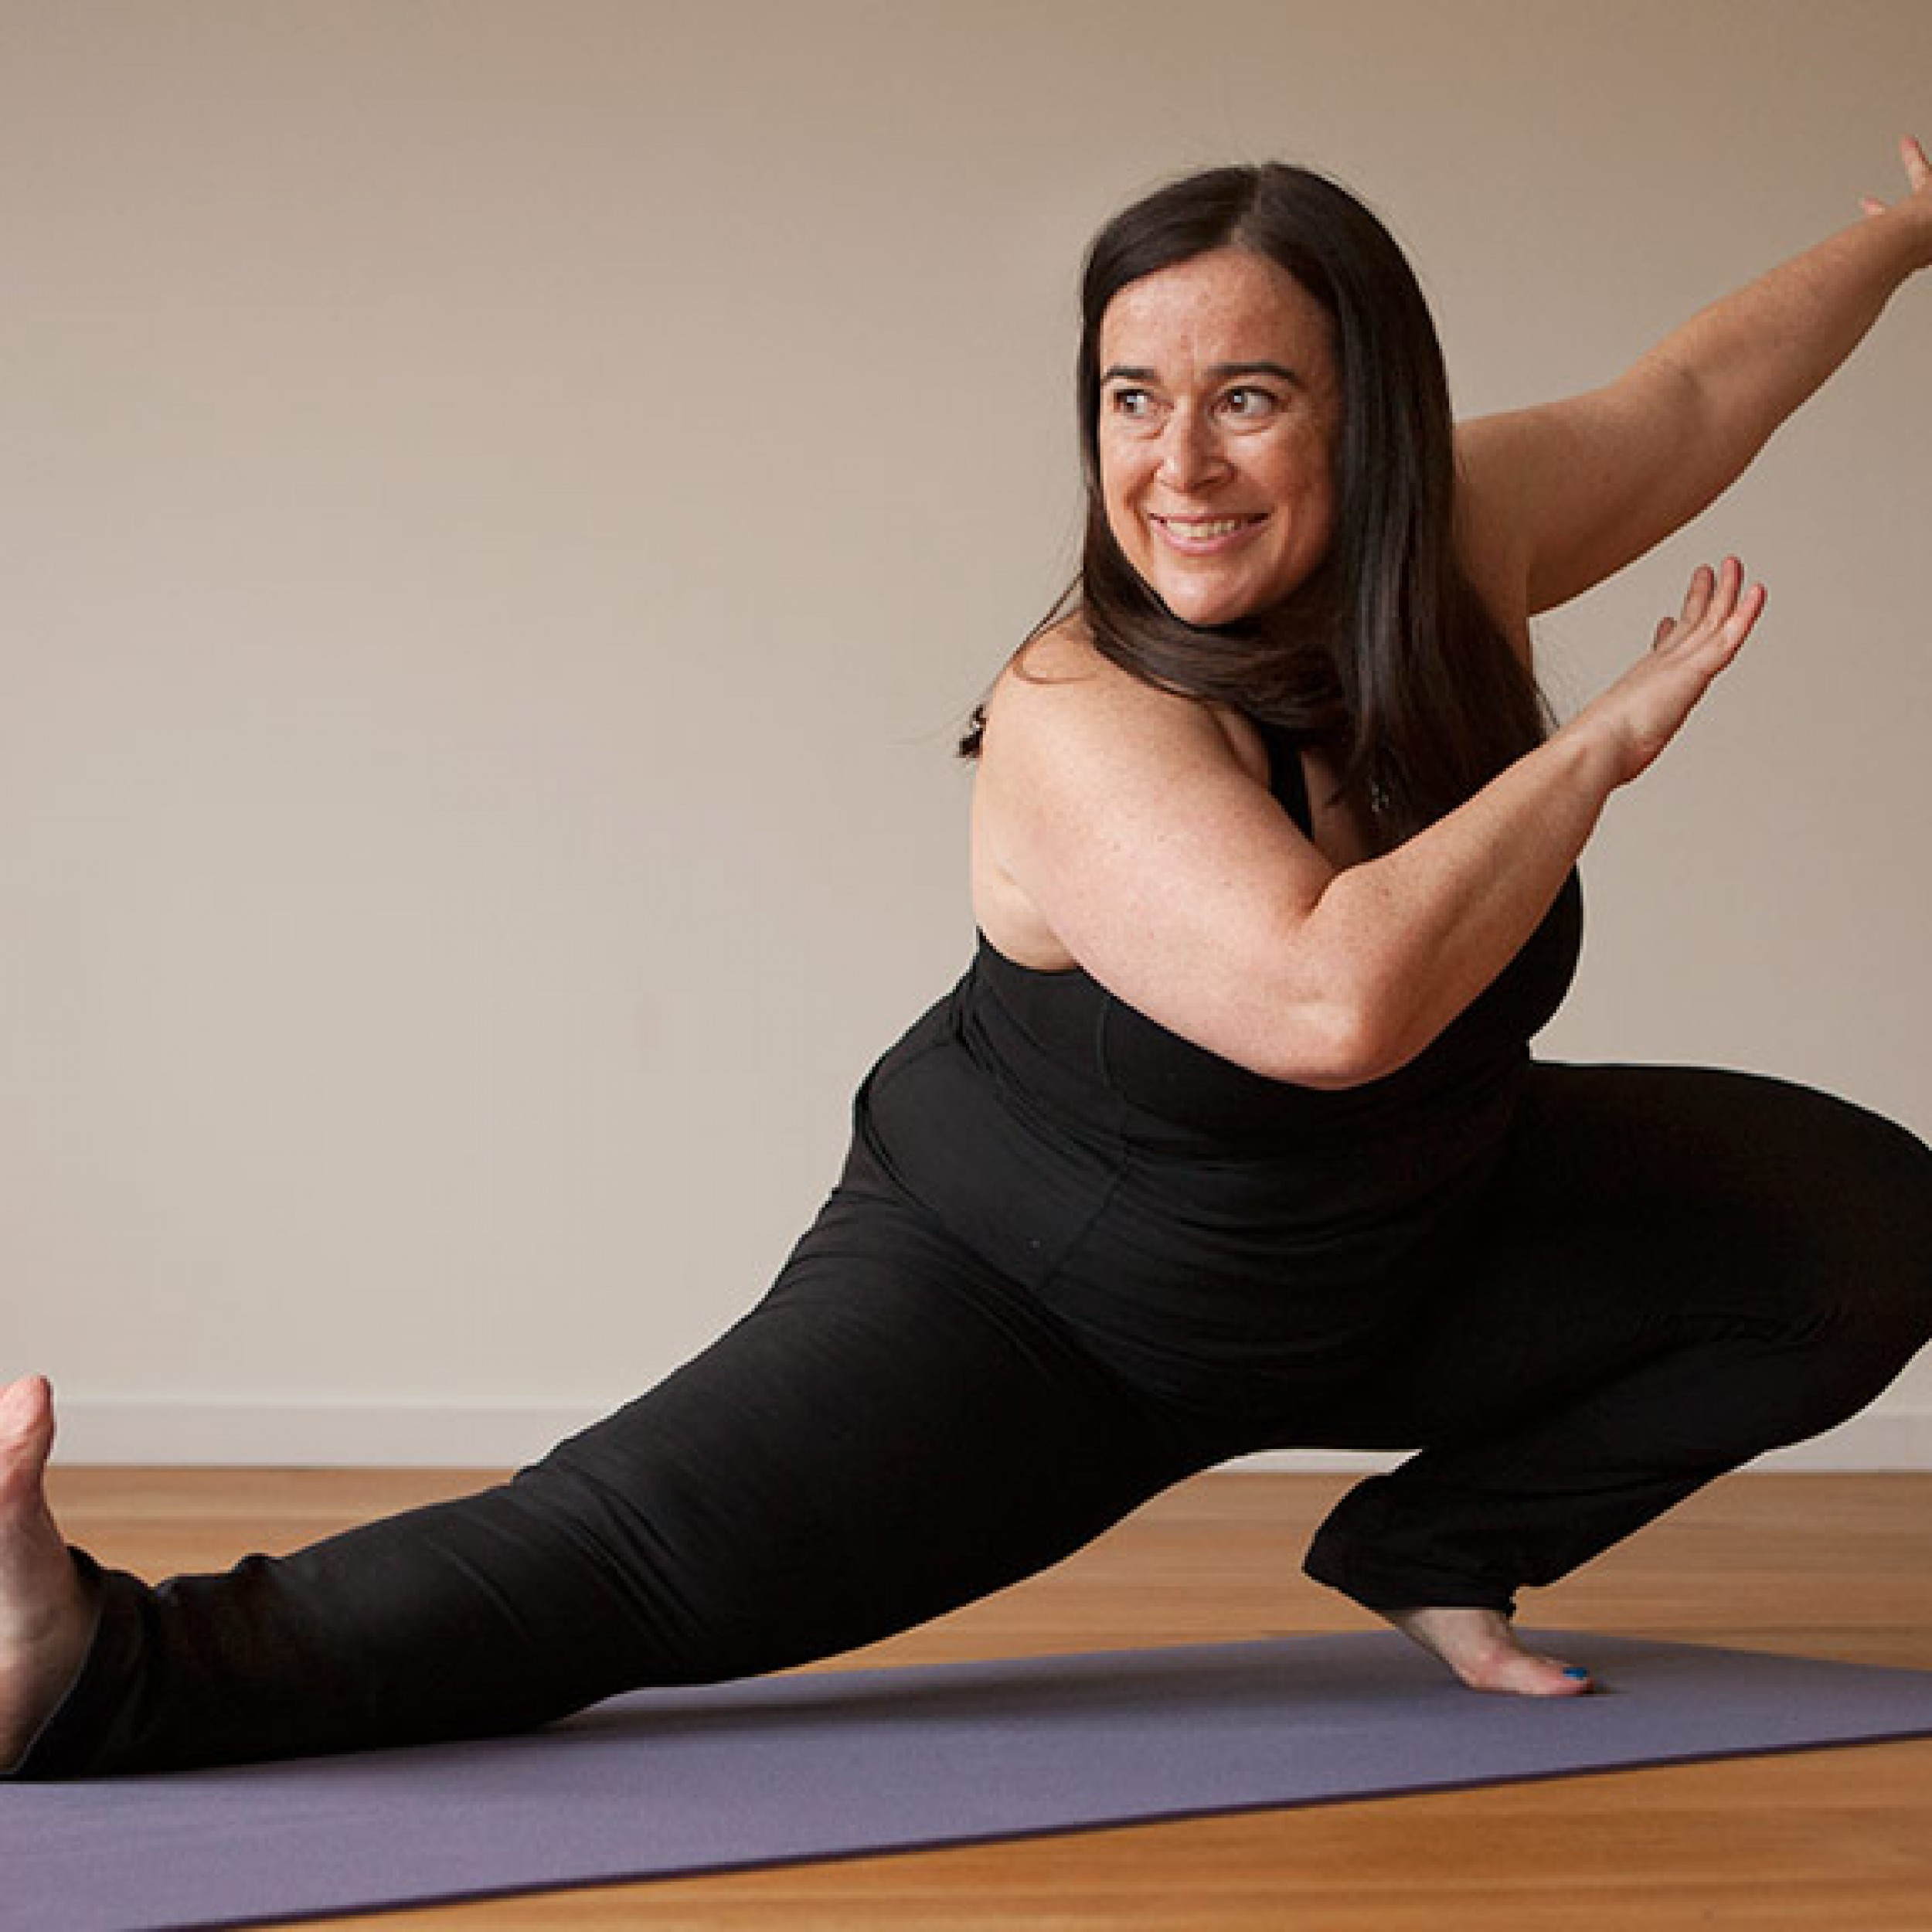 The Yoga Warrior